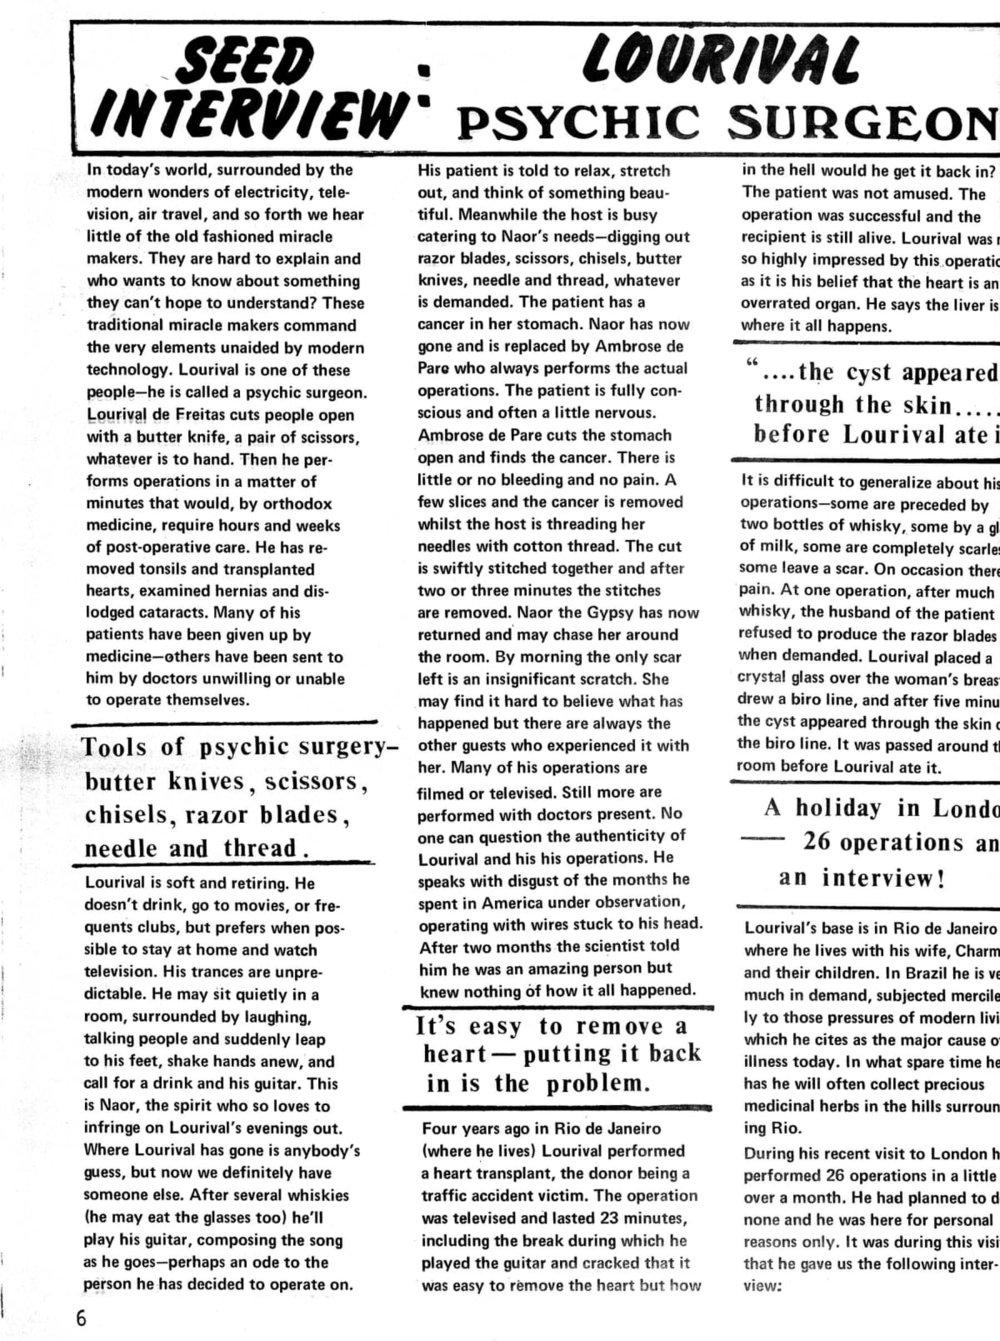 seed-v2-n4-april1973-06.jpg